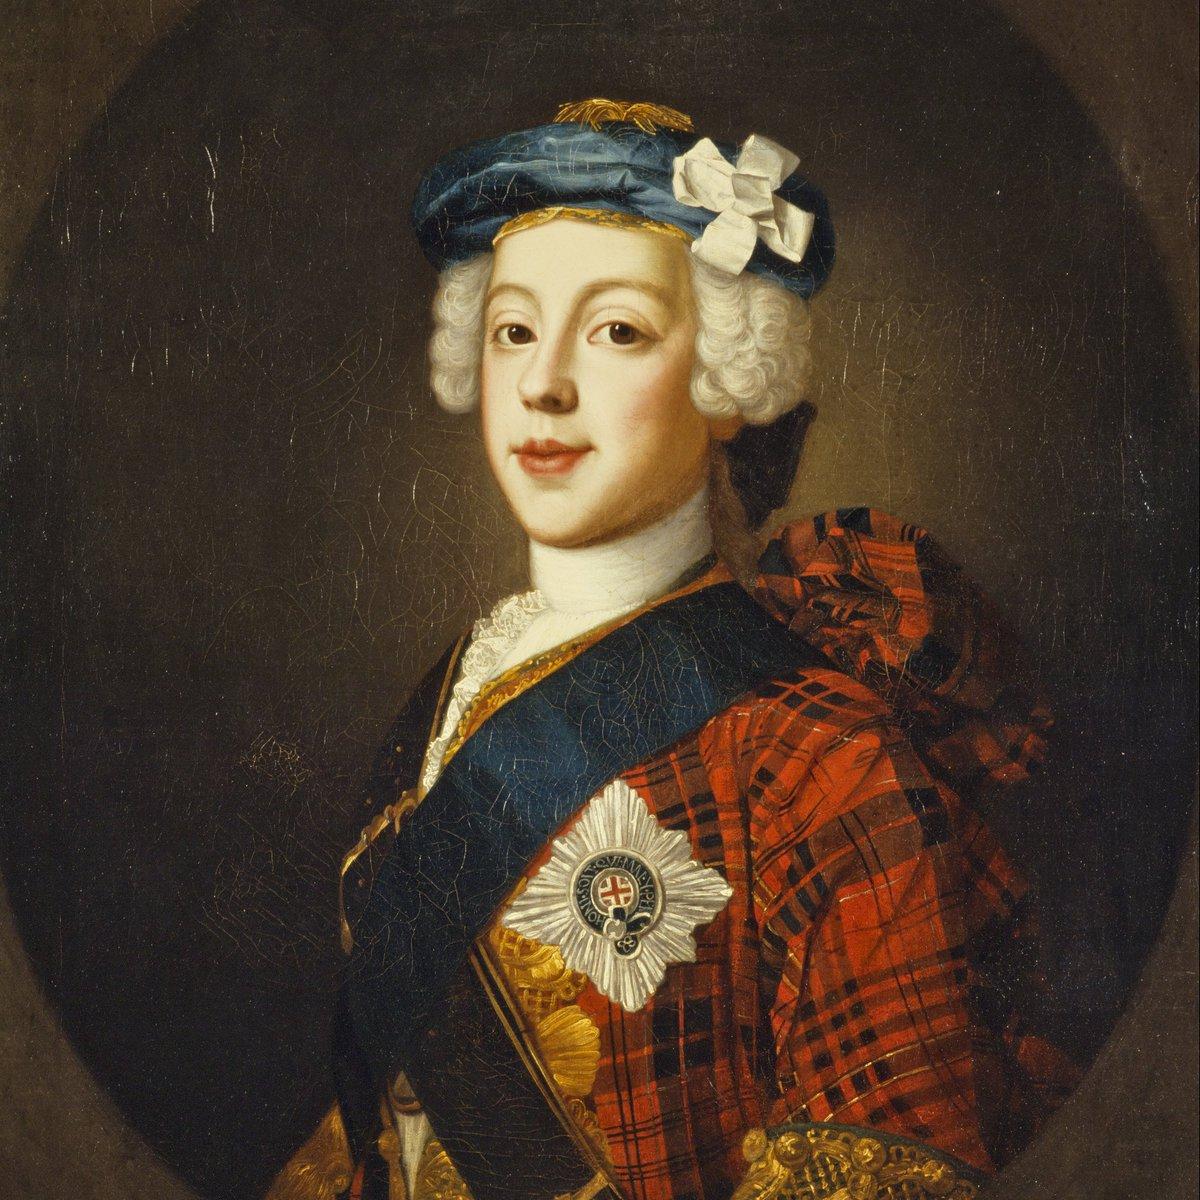 Portrait of Bonnie Prince Charlie in very fancy tartan attire.